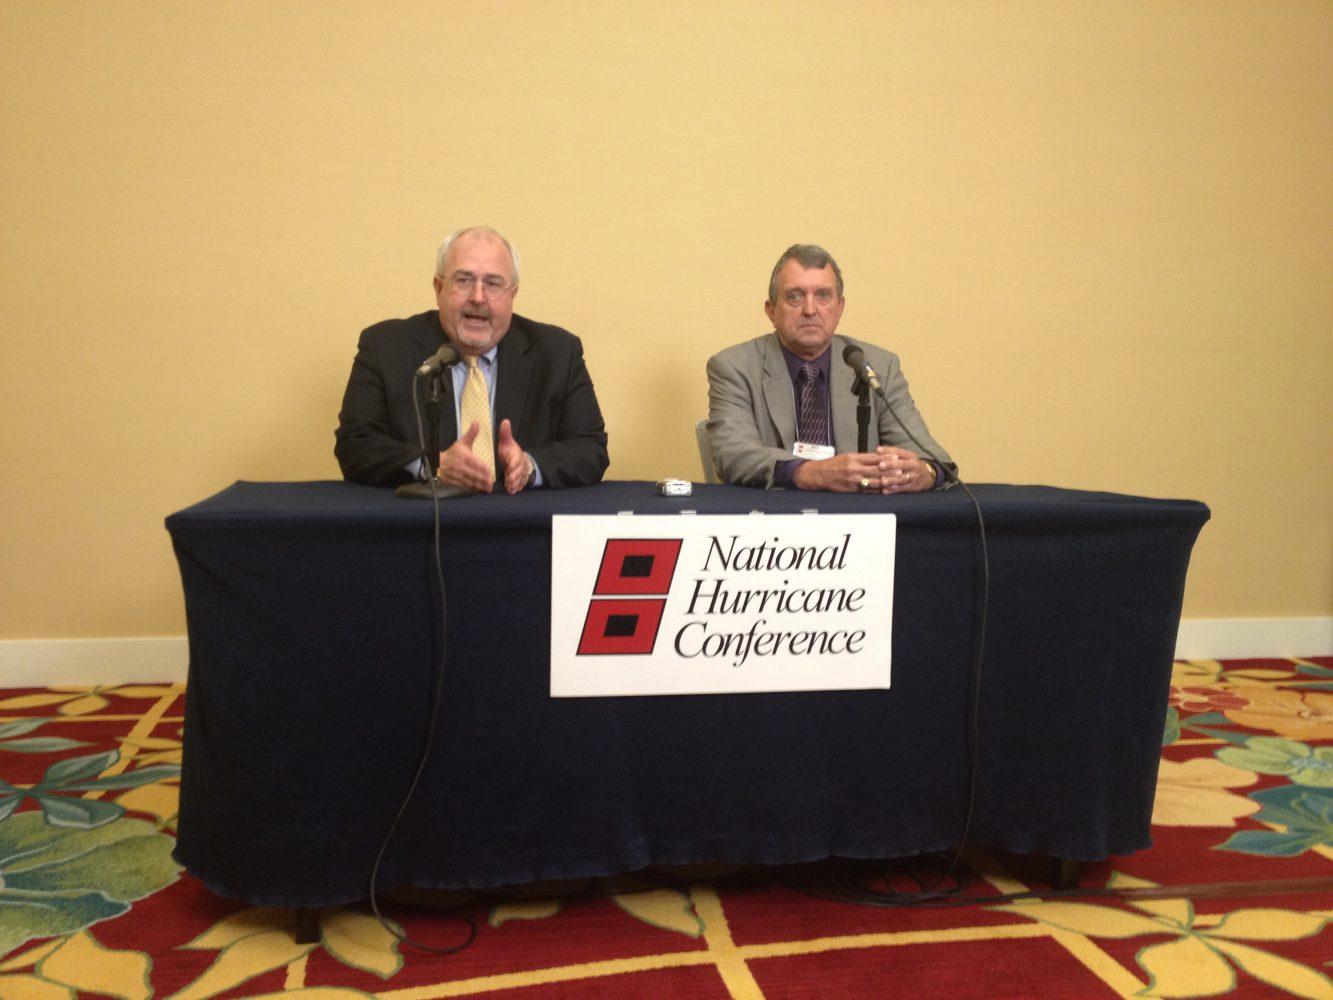 FEMA Director Craig Fugate and National Hurricane Center Director Bill Read (photo by Jeff Huffman)